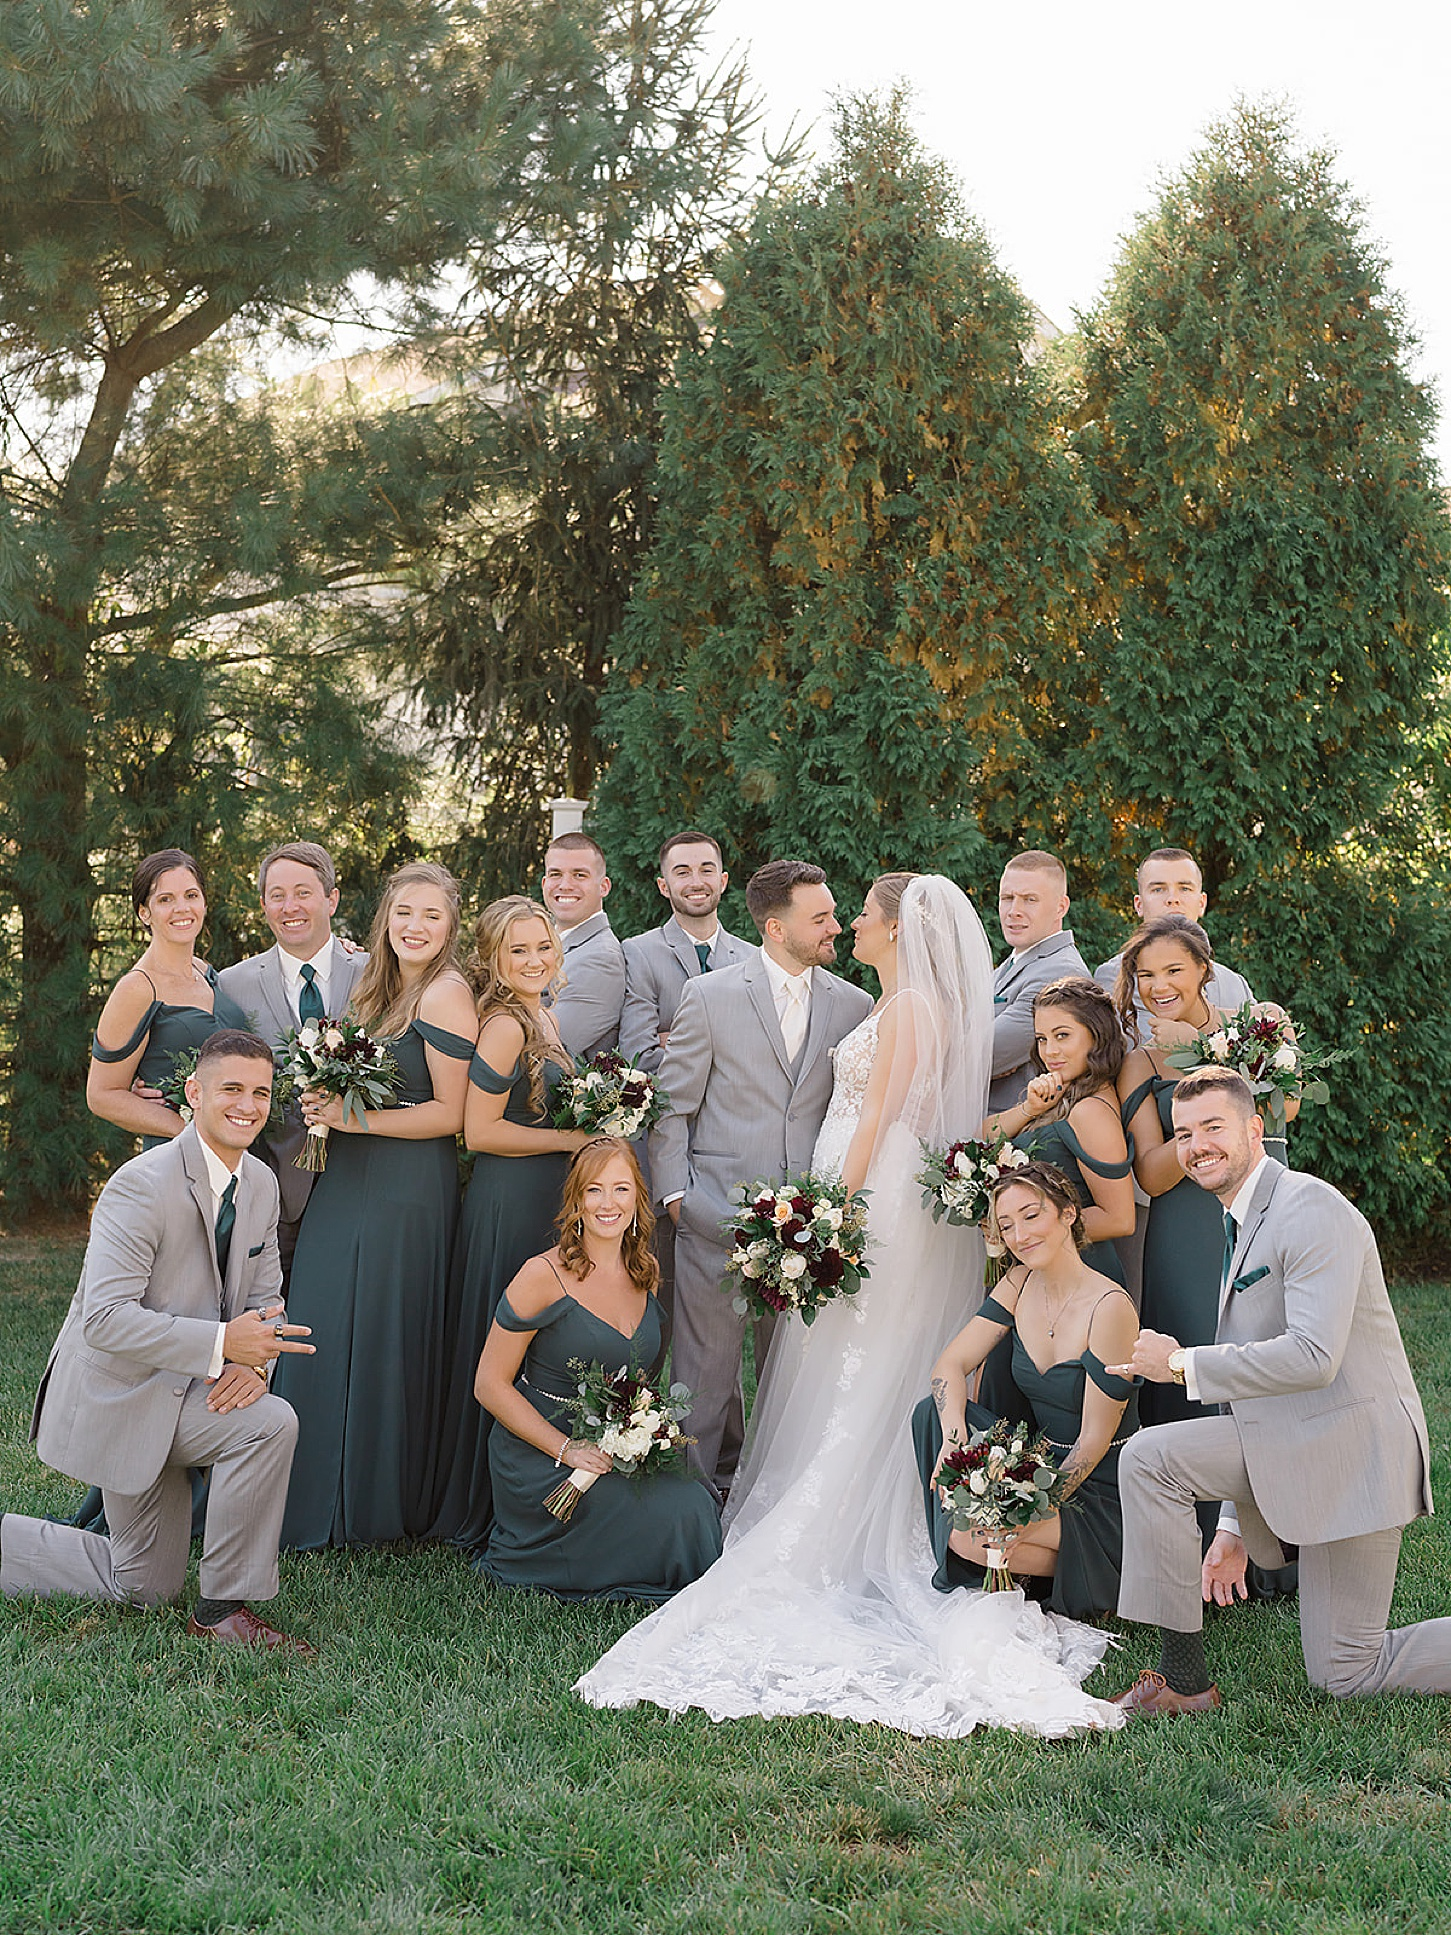 Valenzano Winery Vitners Pavillion Wedding Photography by Magdalena Studios 0016